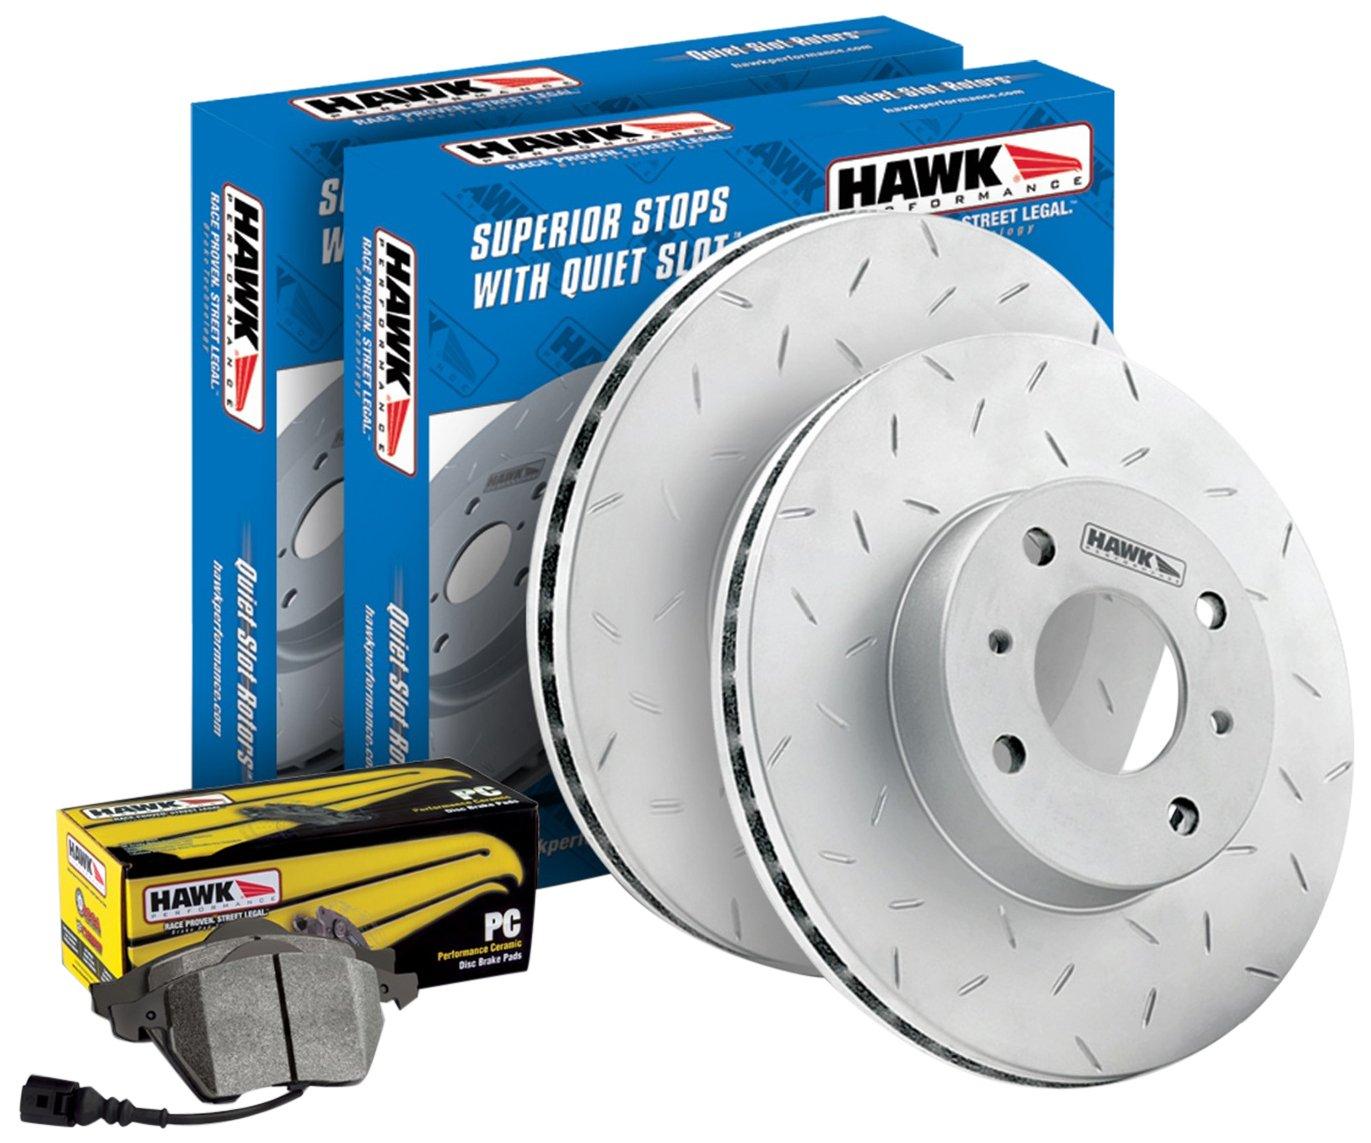 Hawk Performance HKZ8692322 Brake Kit шагомер электронный hawk hkpd6002